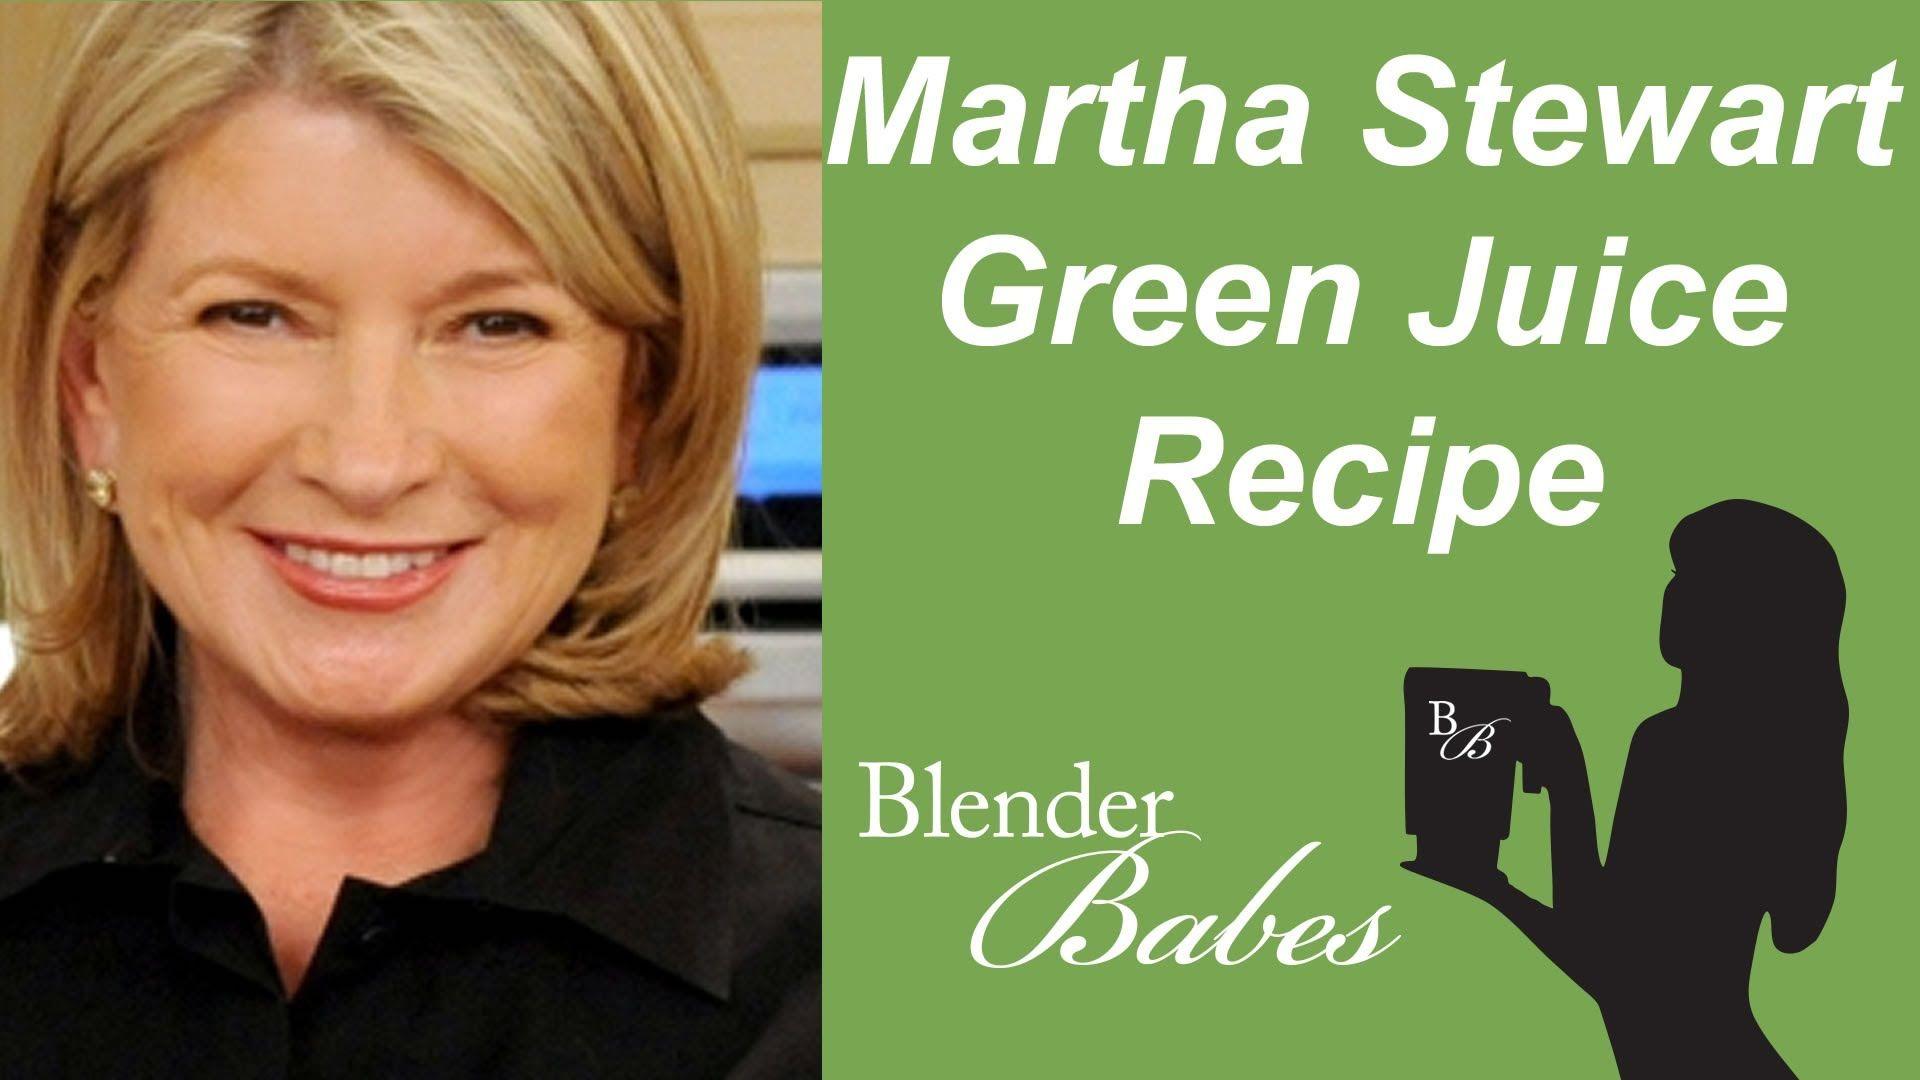 Marta Stewart's Green Juice. @BlenderBabes www.blenderbabes.com #vitamix #blendtec #recipe #martha #stewart #green #juice